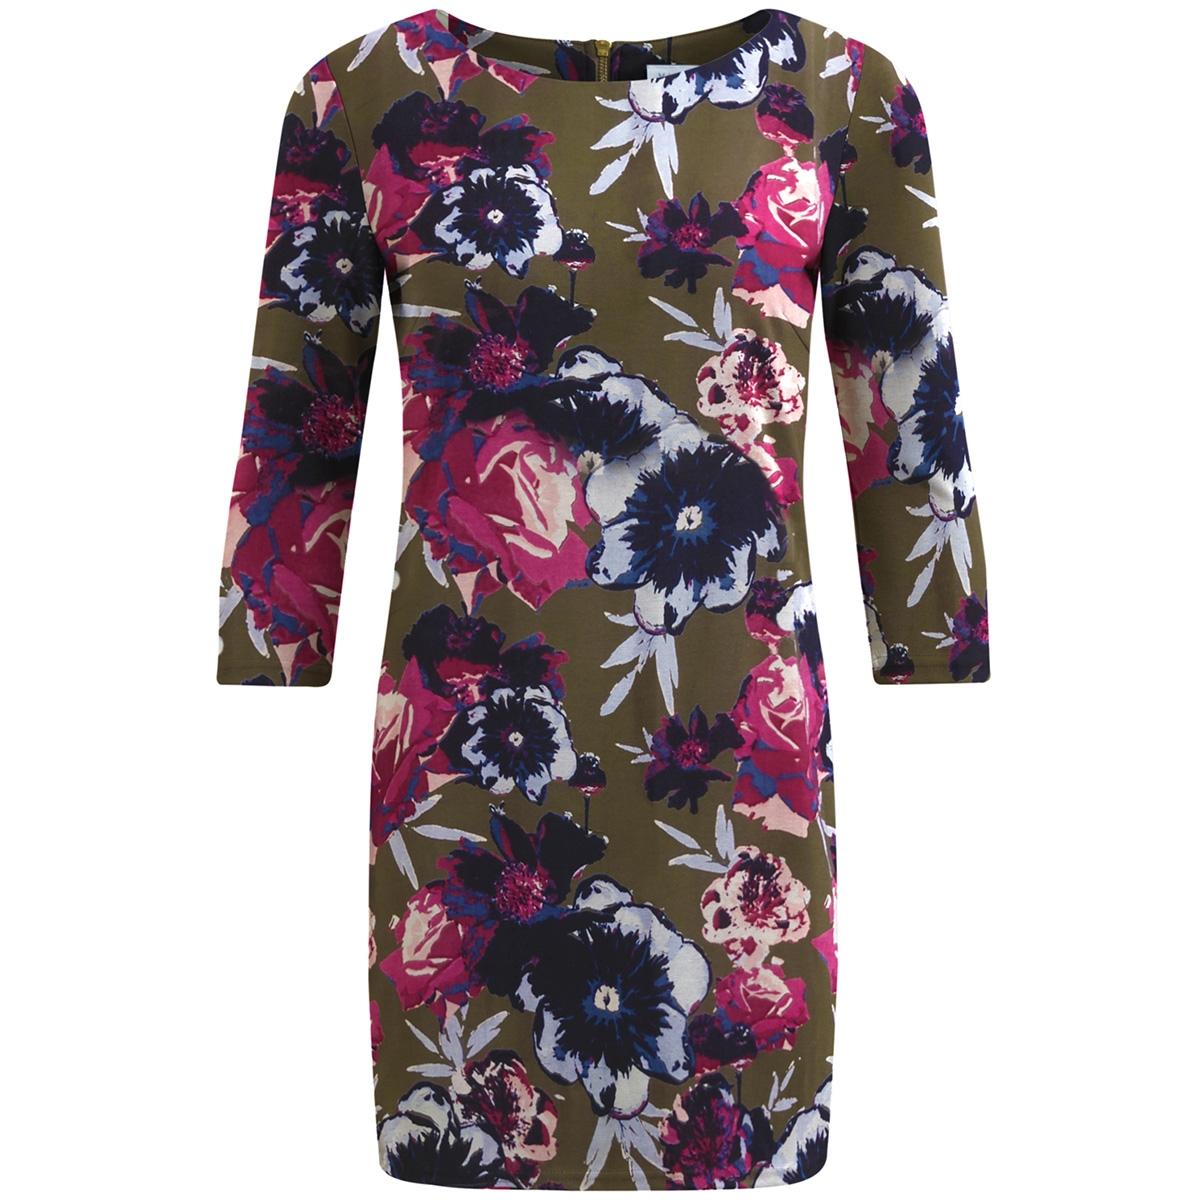 vitinny 3/4 astha dress 14046310 vila jurk ivy green/viastha pr